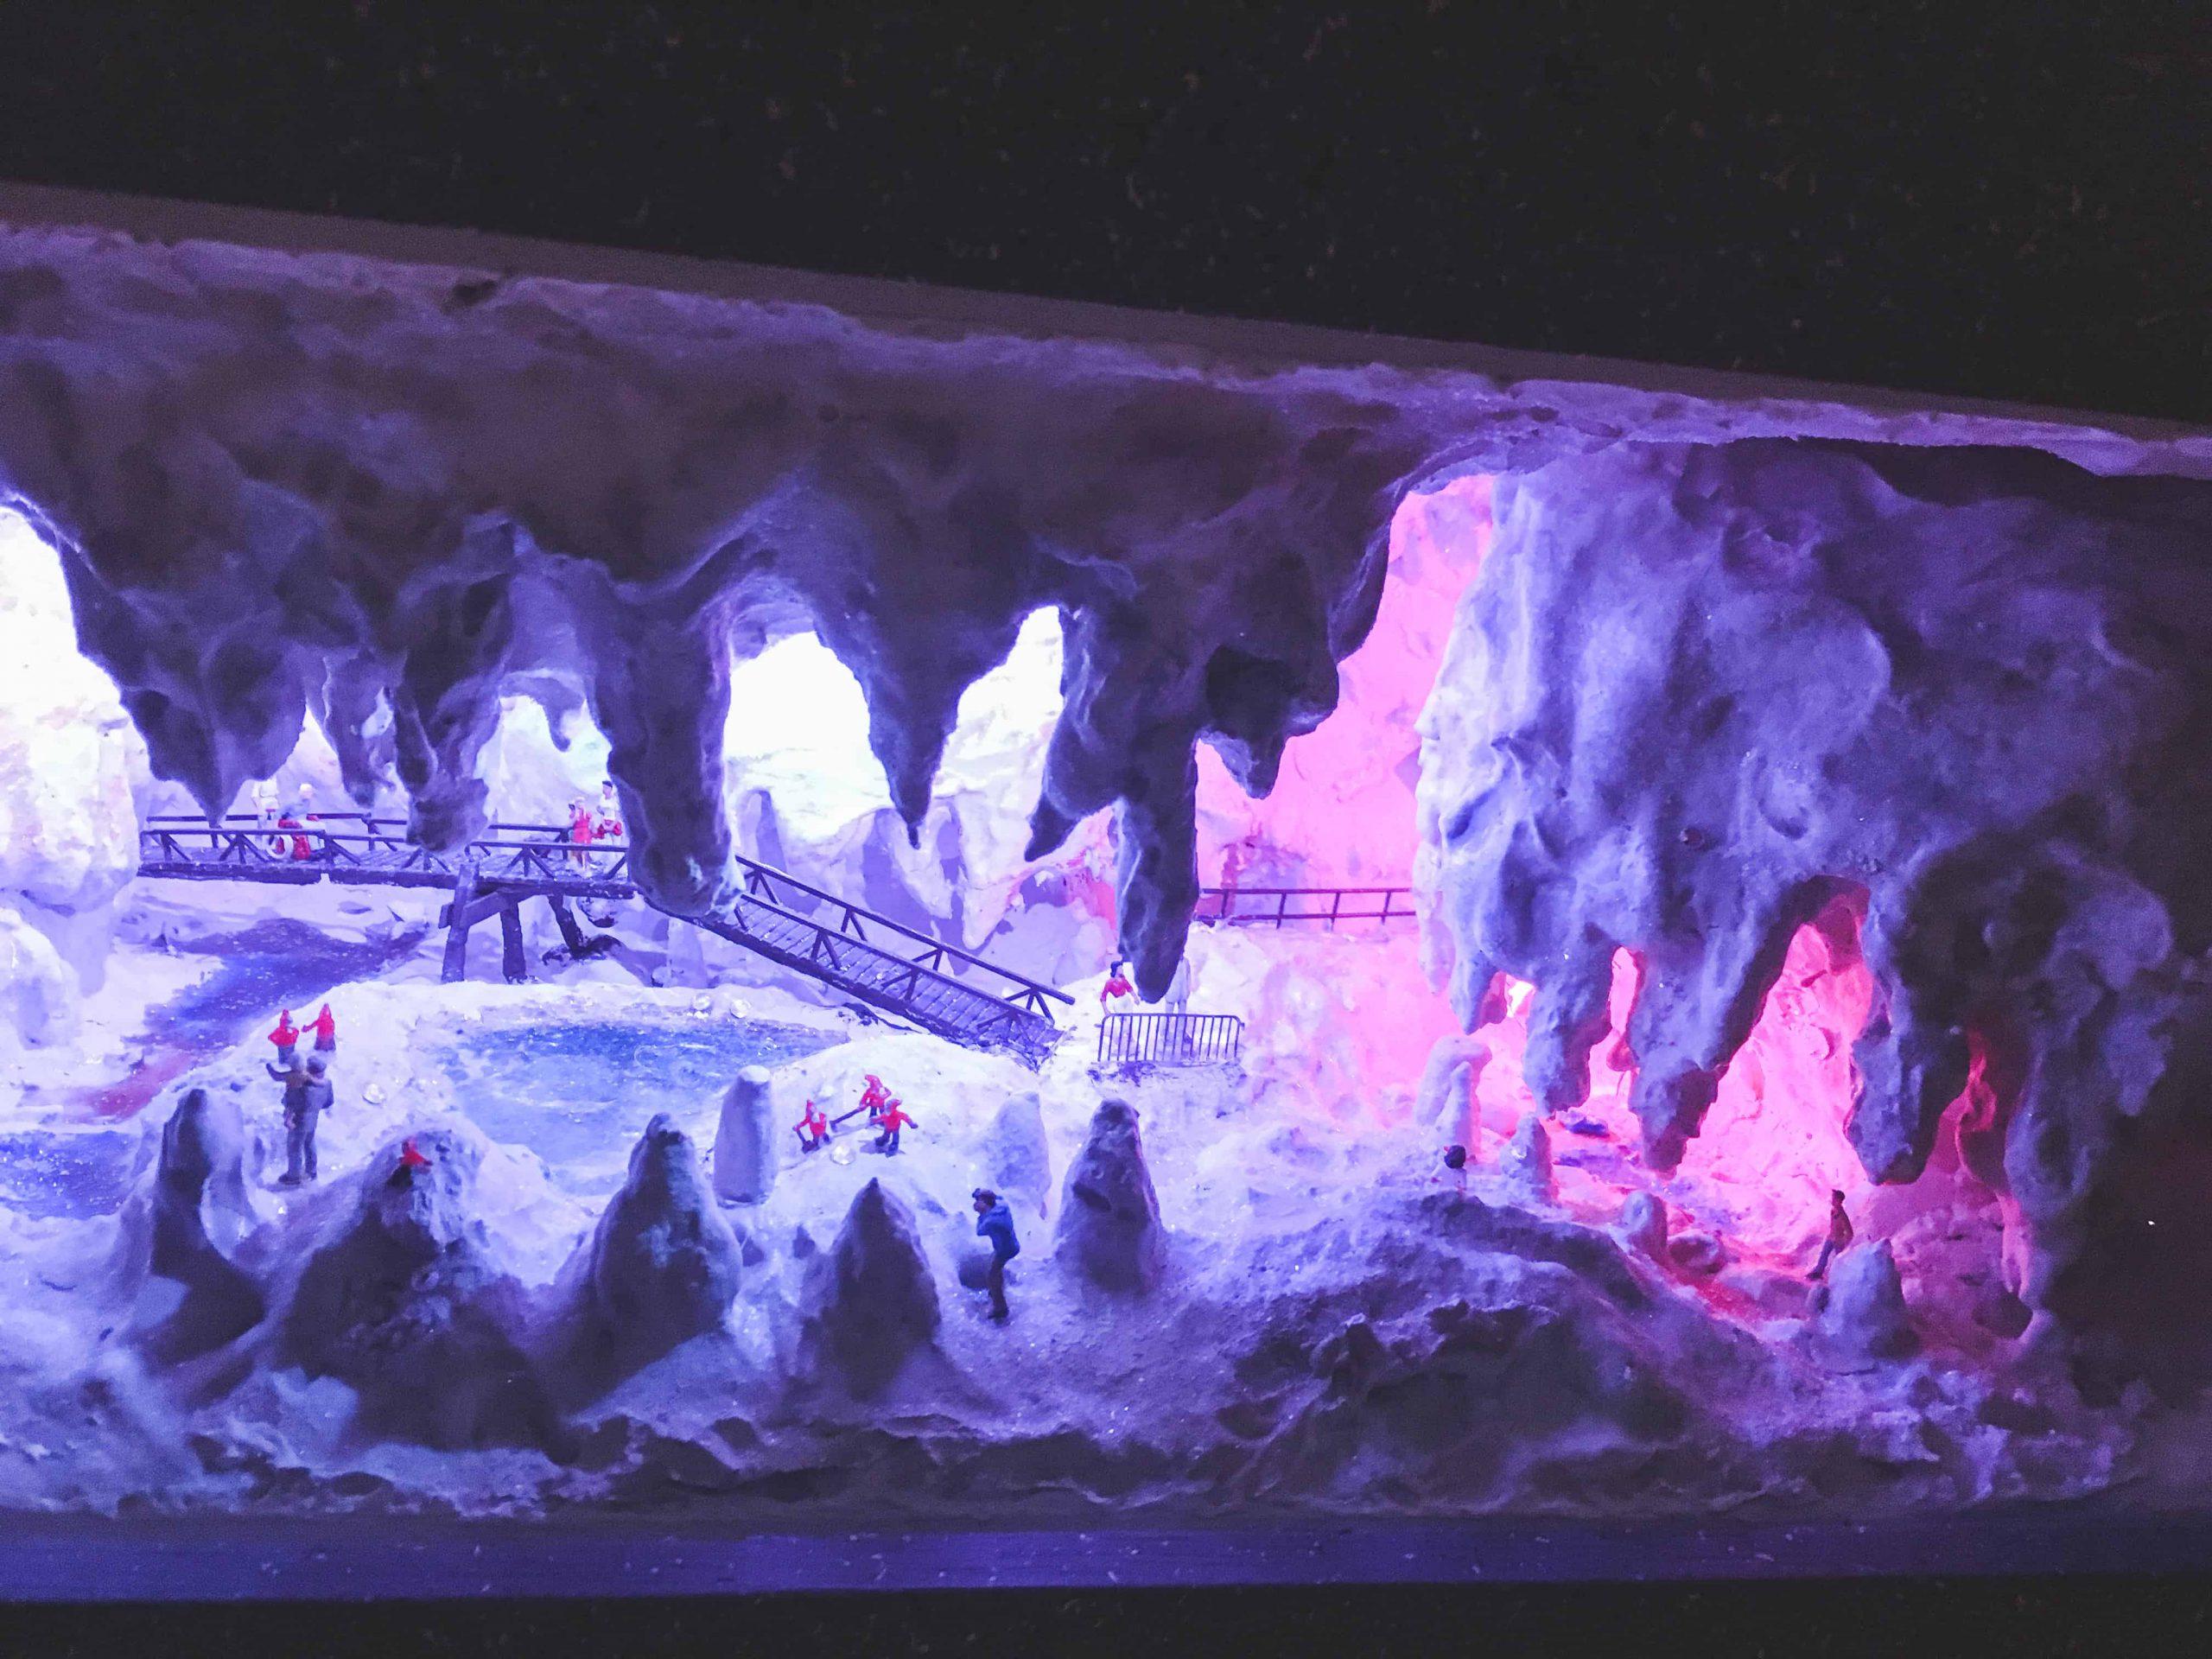 Cave installation in Miniatur Wunderland